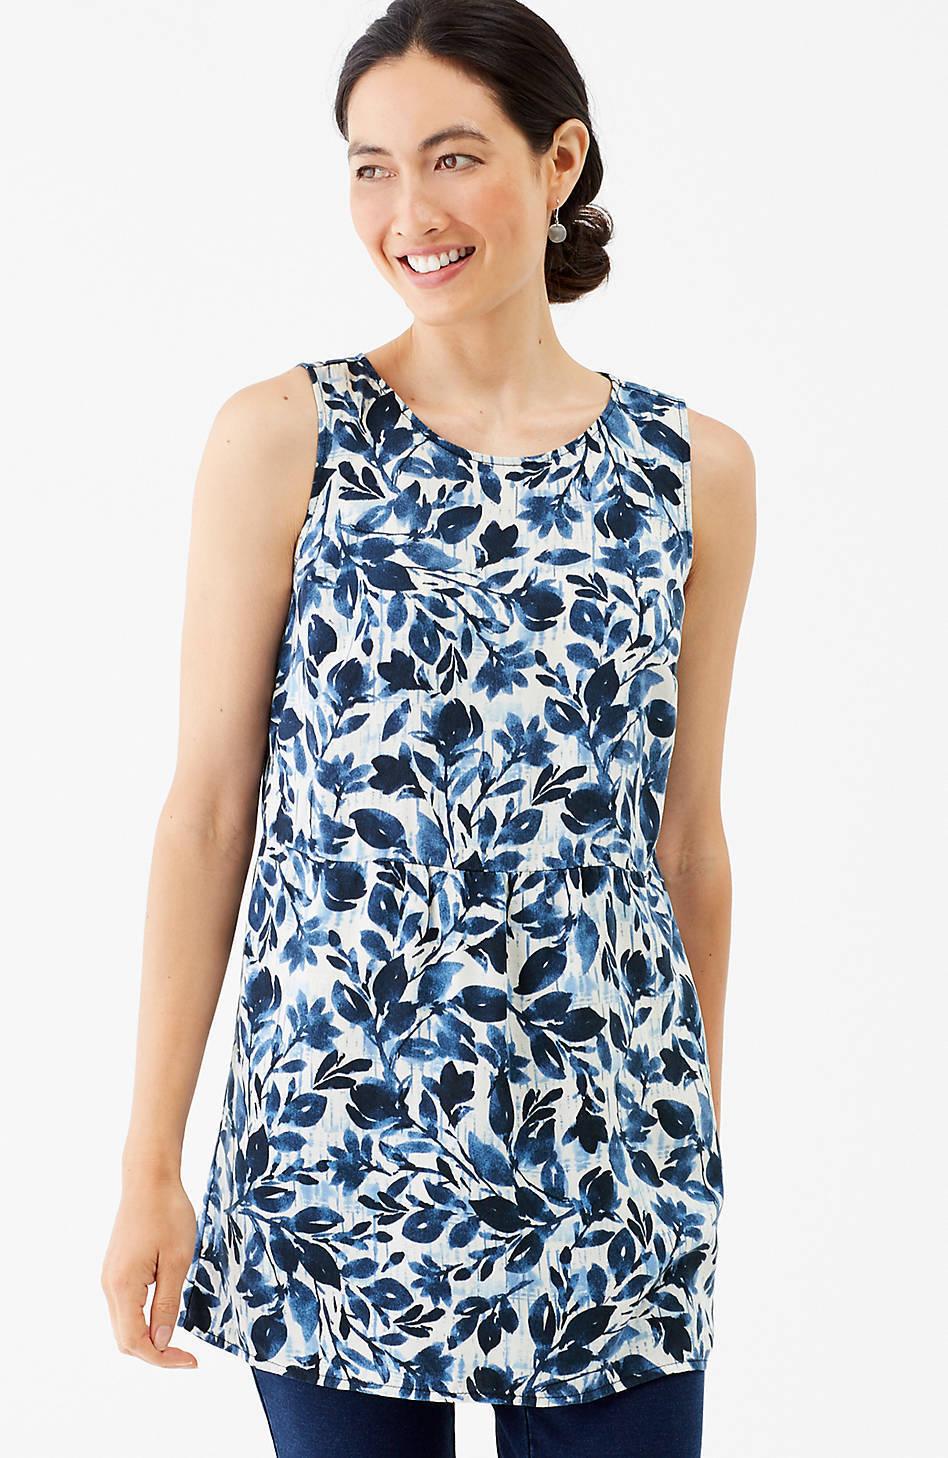 NWT - J. Jill - XL - Beautiful Pure Jill Tencel Cream Batik Trellis Print Tunic